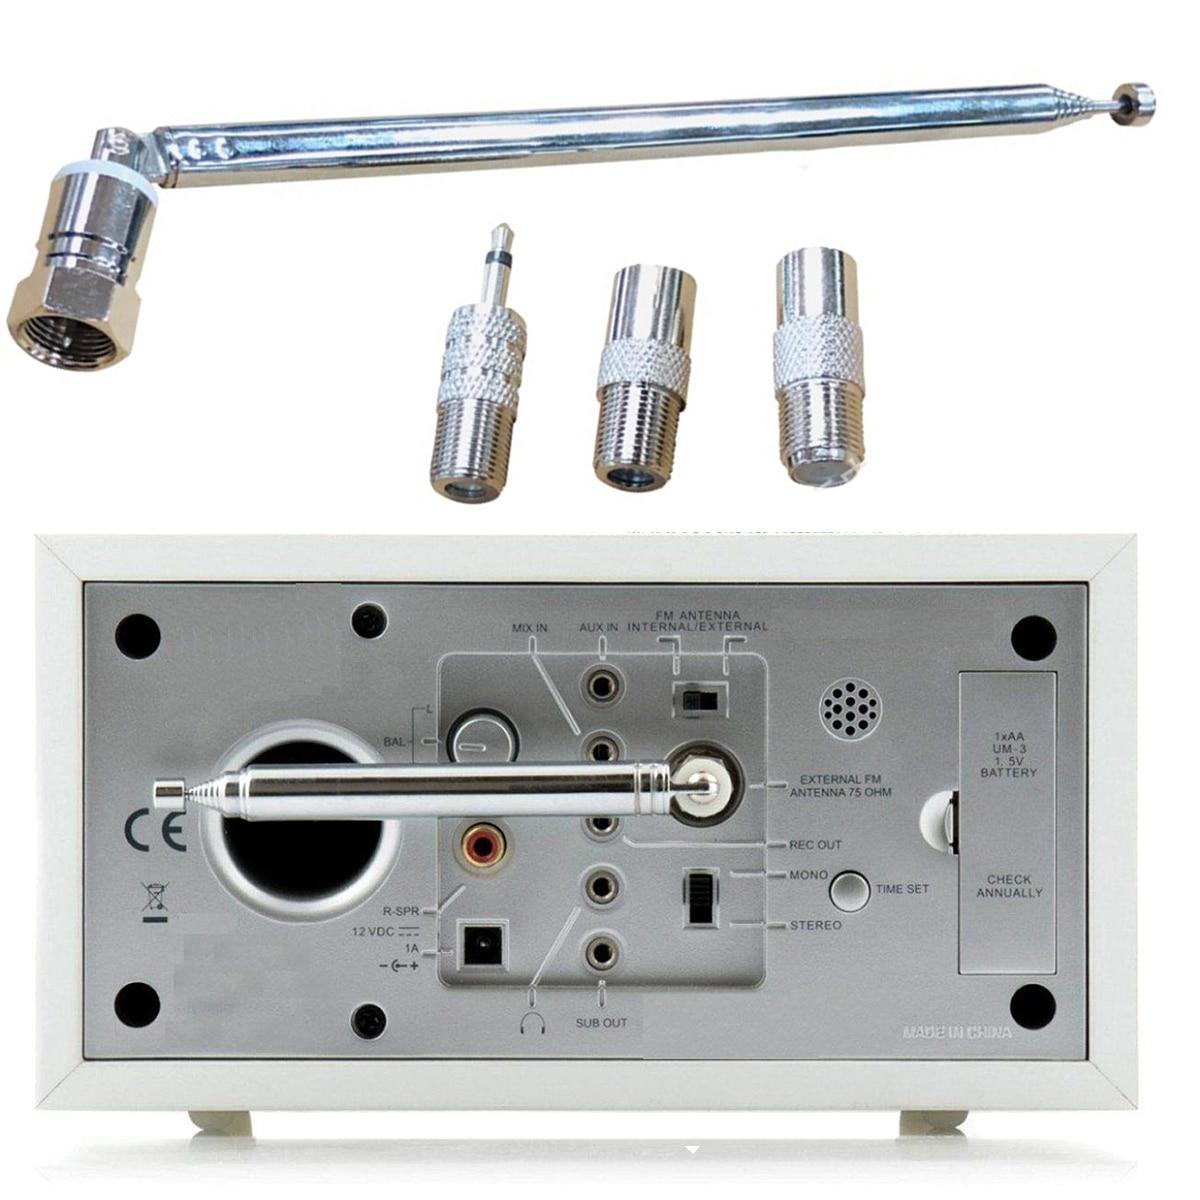 SOONHUA 4pcs/set FM Radio Antenna 75 Ohm Radio Antenna F Type Male Telescopic Antennas With Adapter